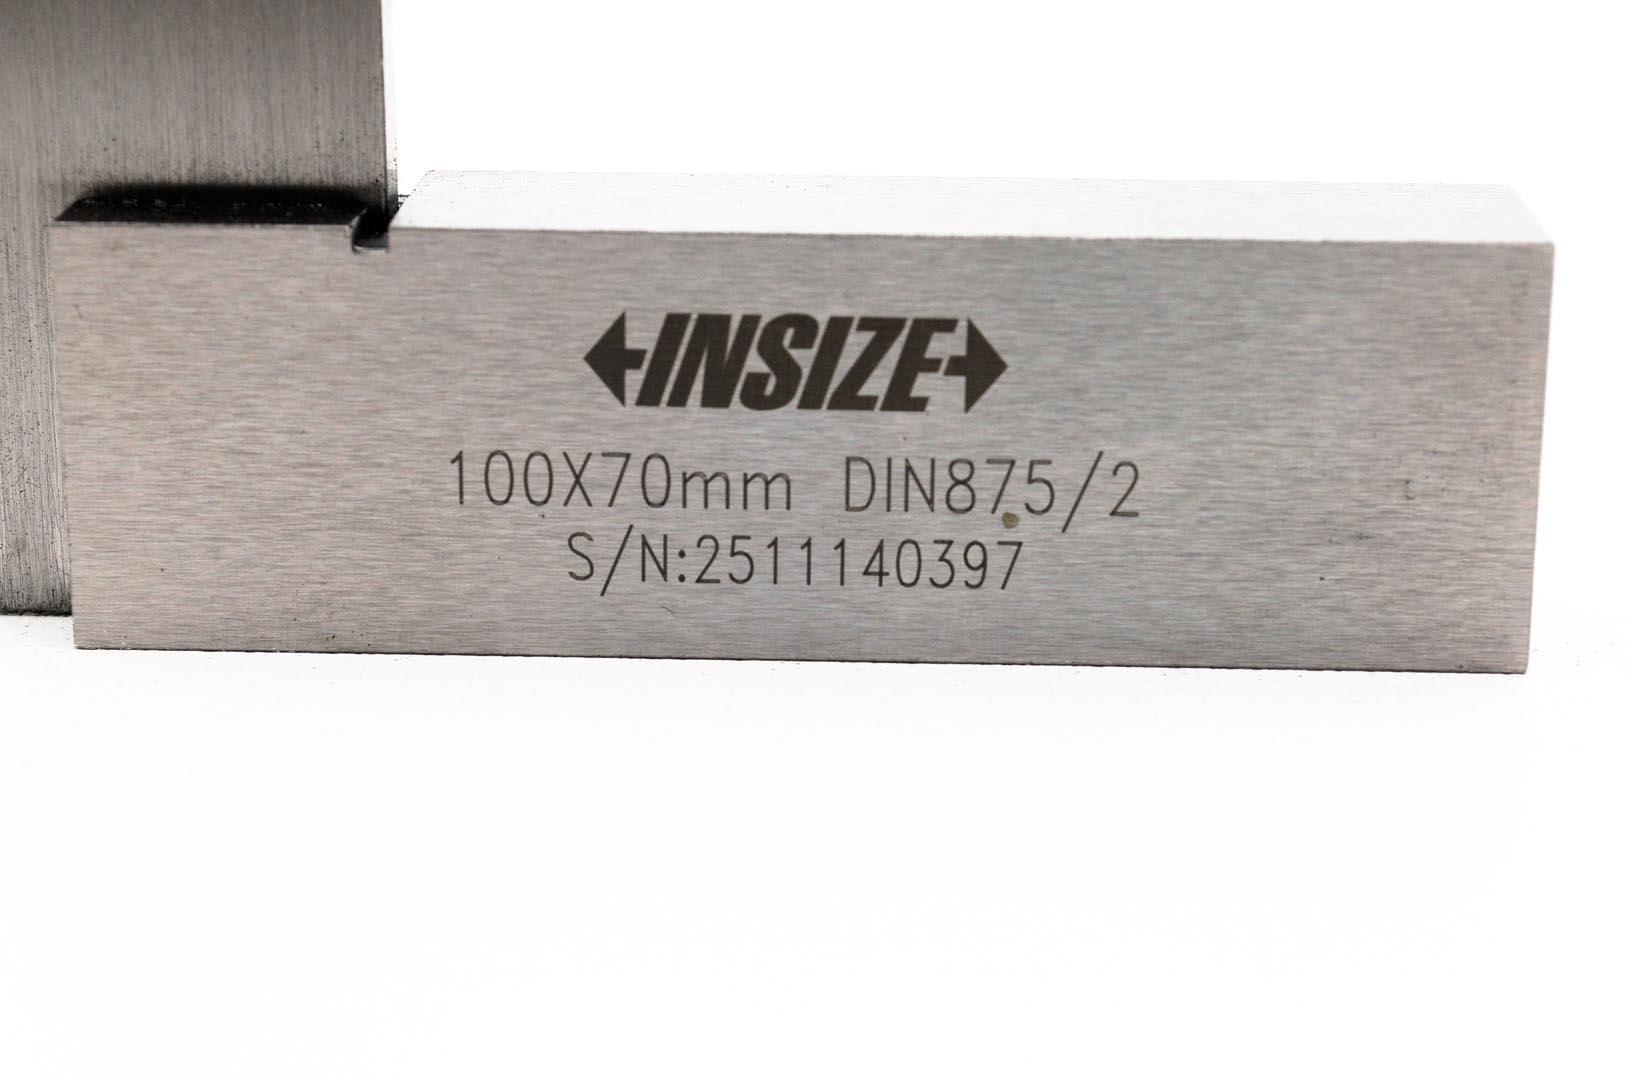 4707-100-Escuadra de ingenieros pelo con tope 100x70mm grado 2, INSIZE 4707-100-max-6.